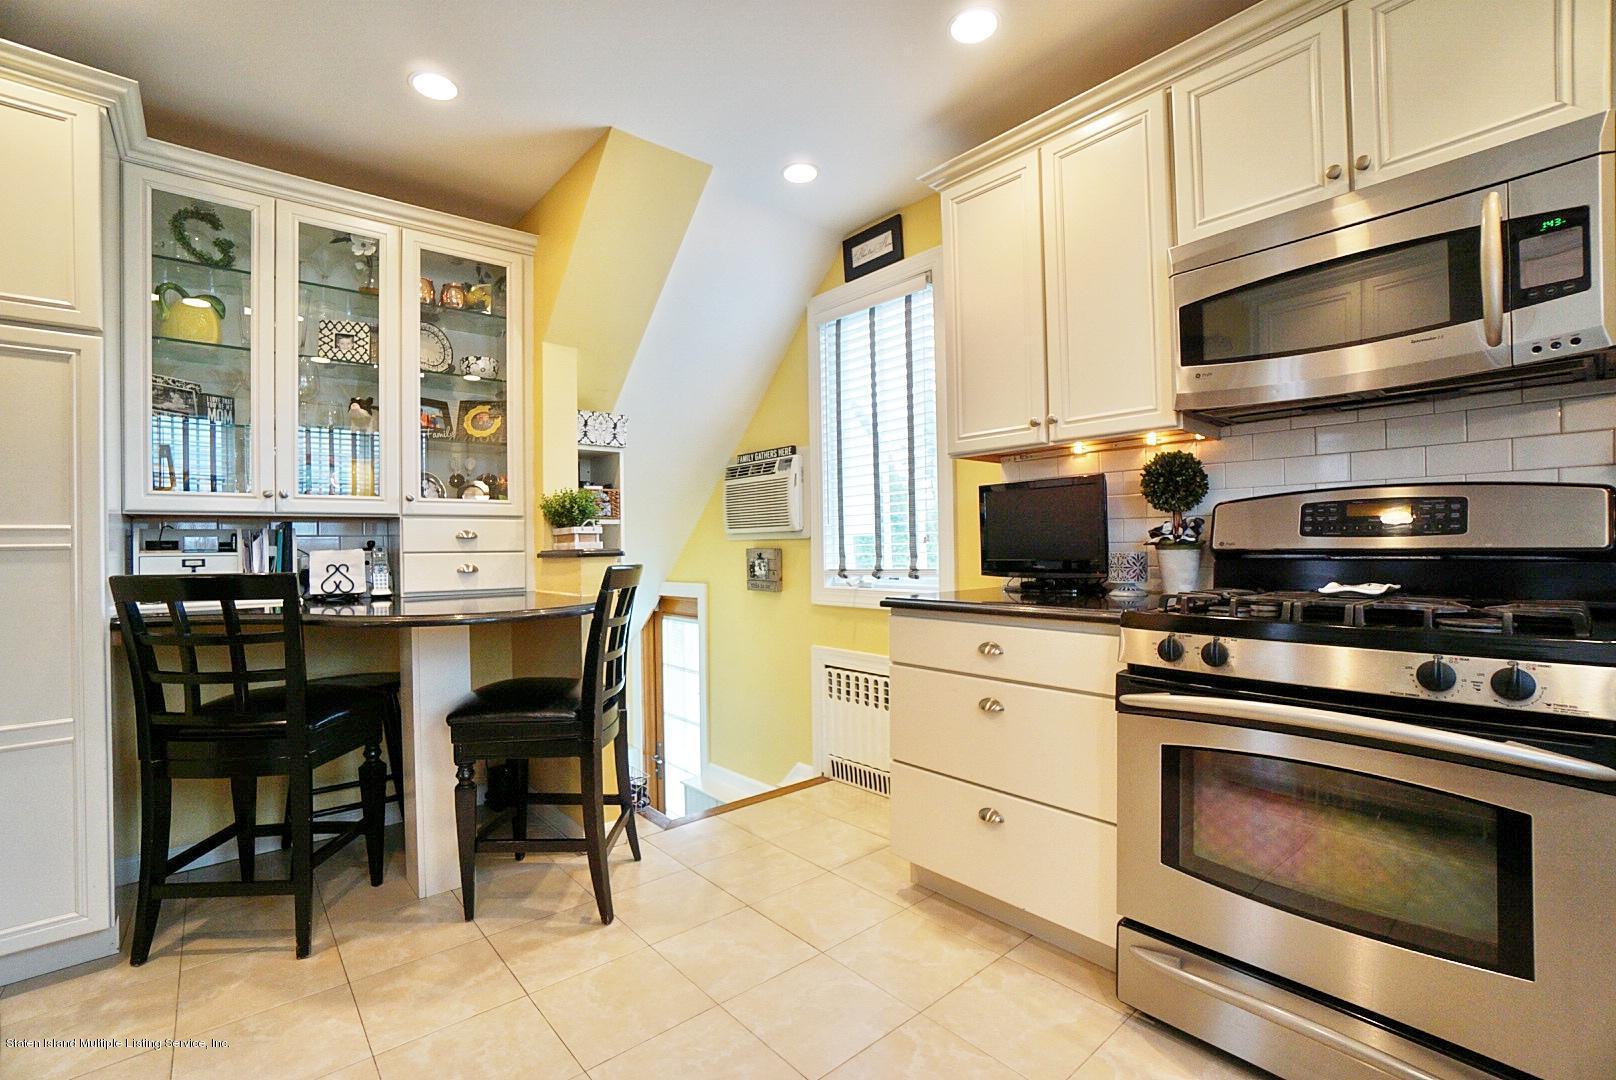 Single Family - Detached 171 Keiber Court  Staten Island, NY 10314, MLS-1127425-16